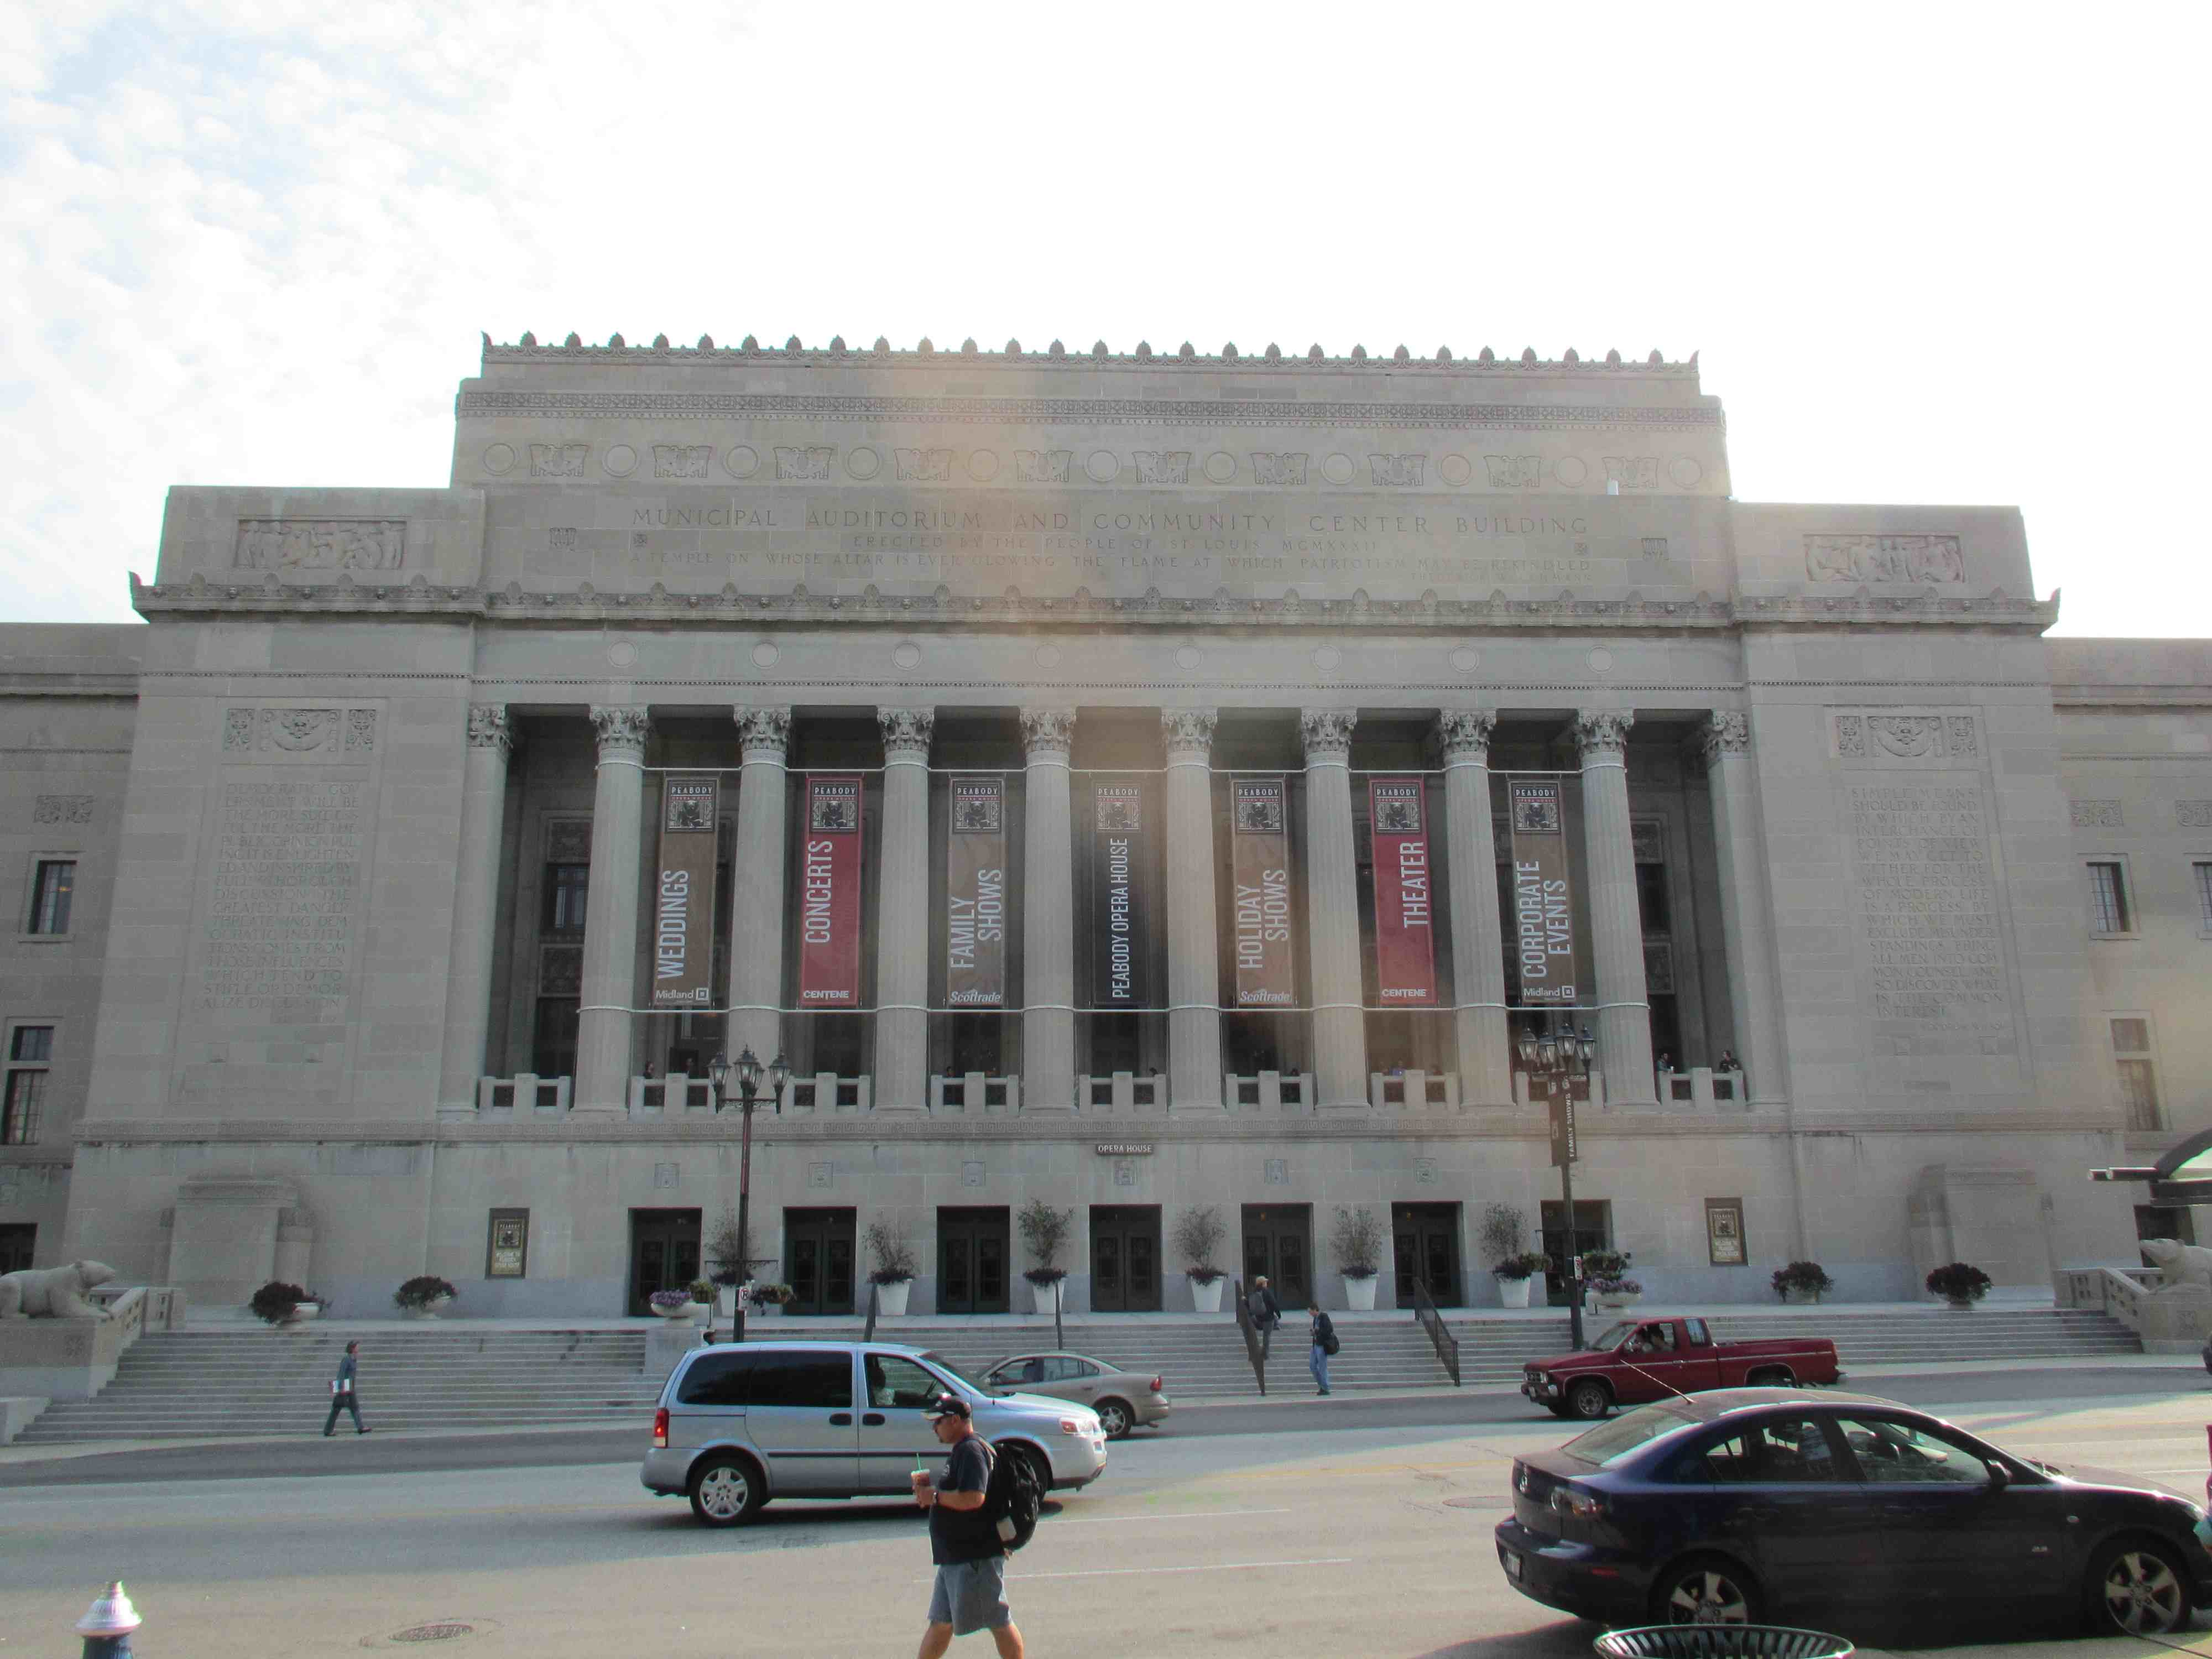 the Peabody Opera House